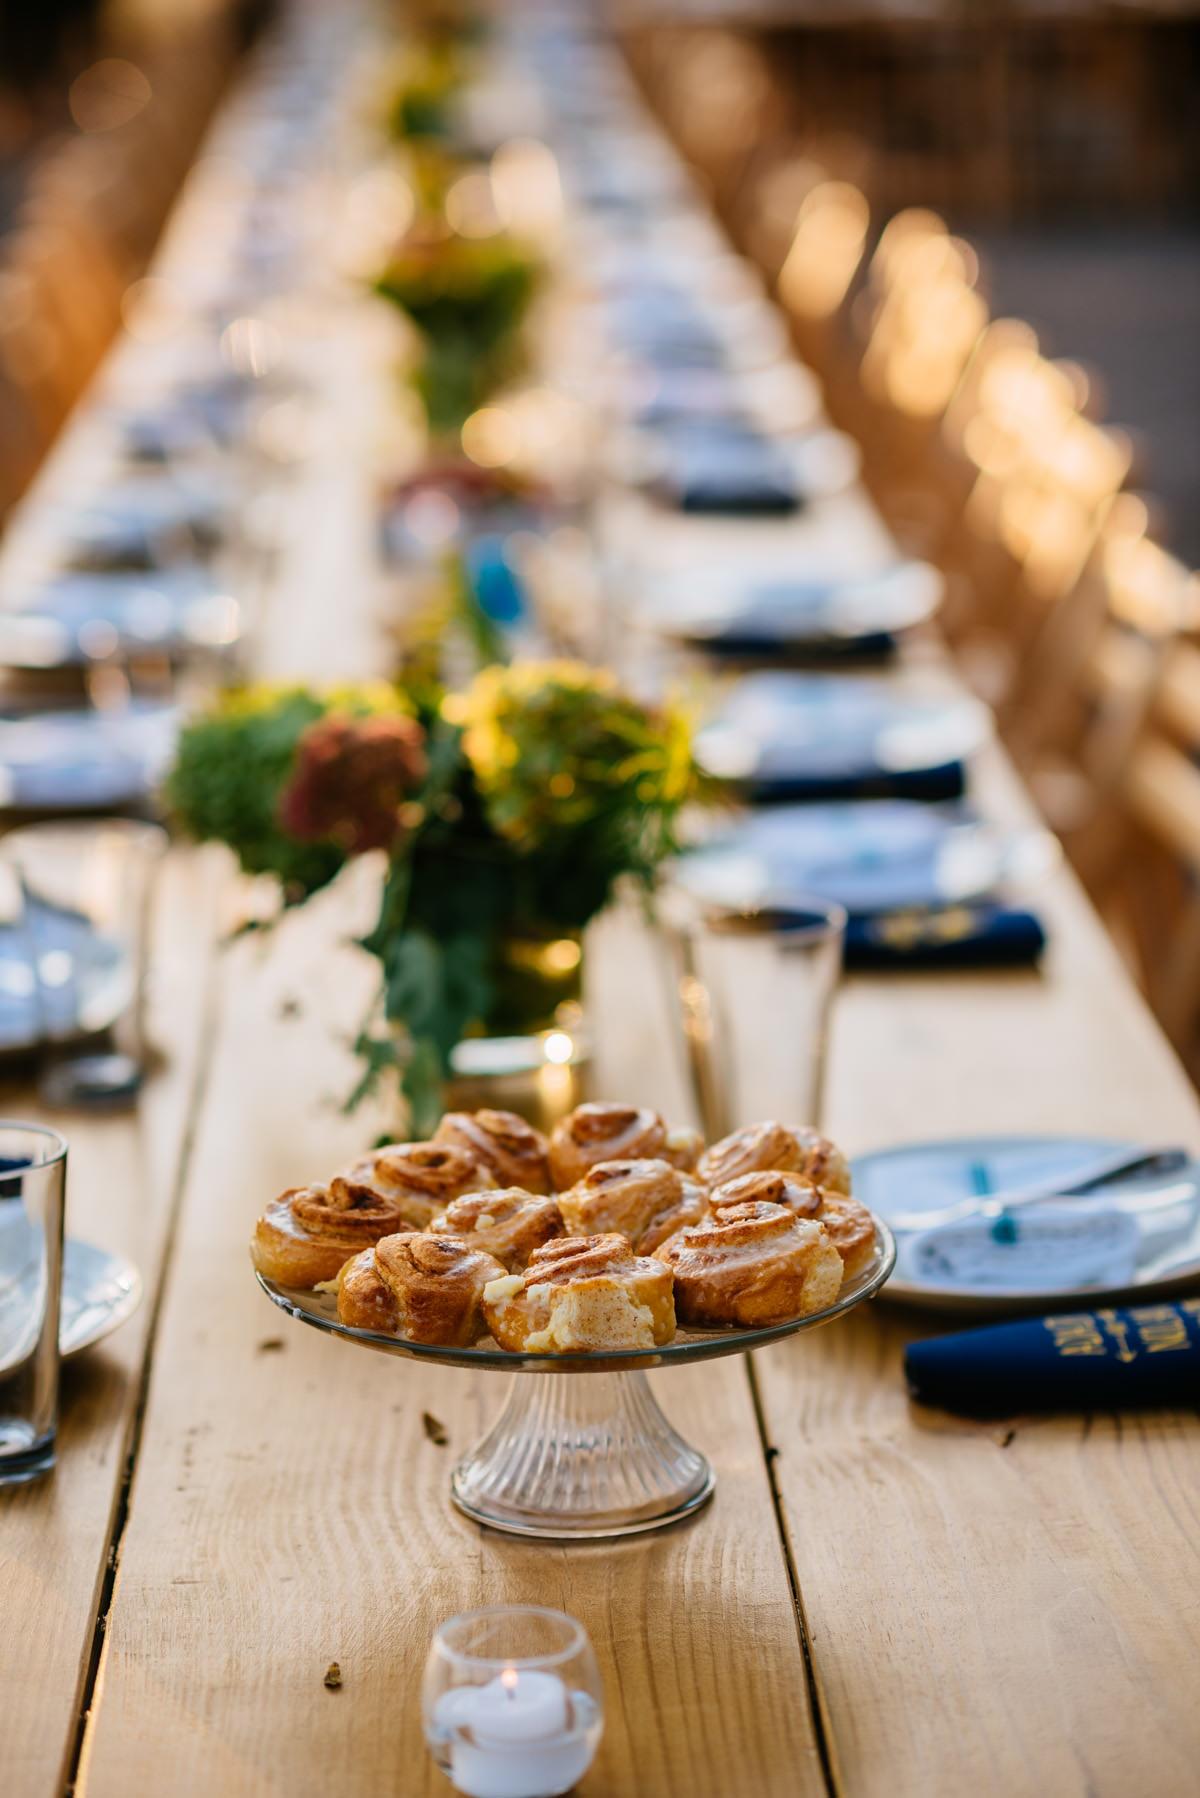 south hills market cinnamon rolls jq dickinson saltworks wedding reception brunch